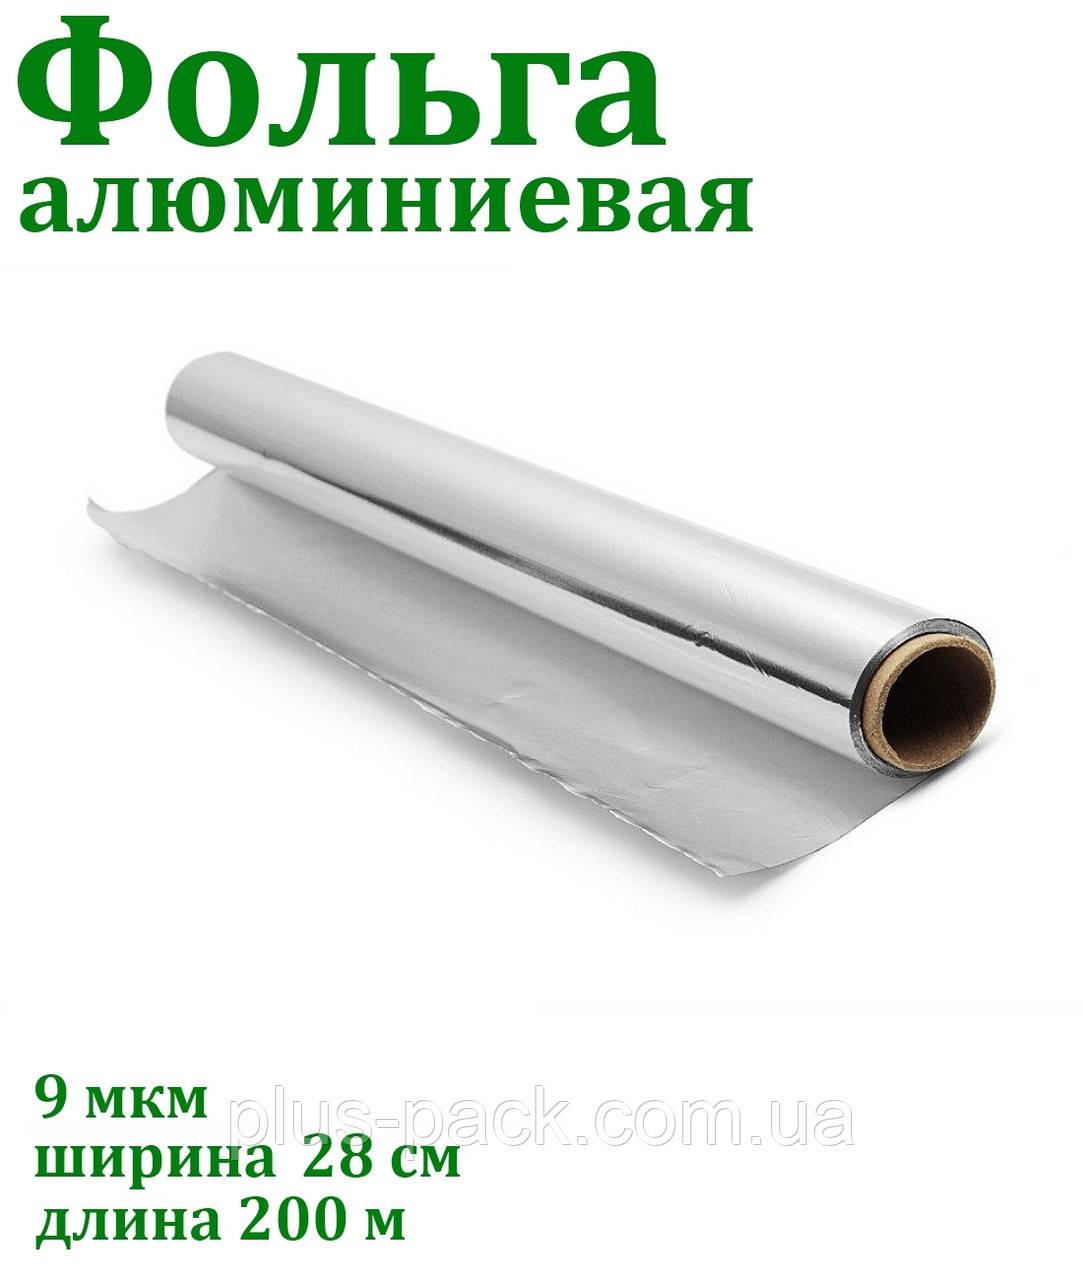 Харчова фольга 9мкм.